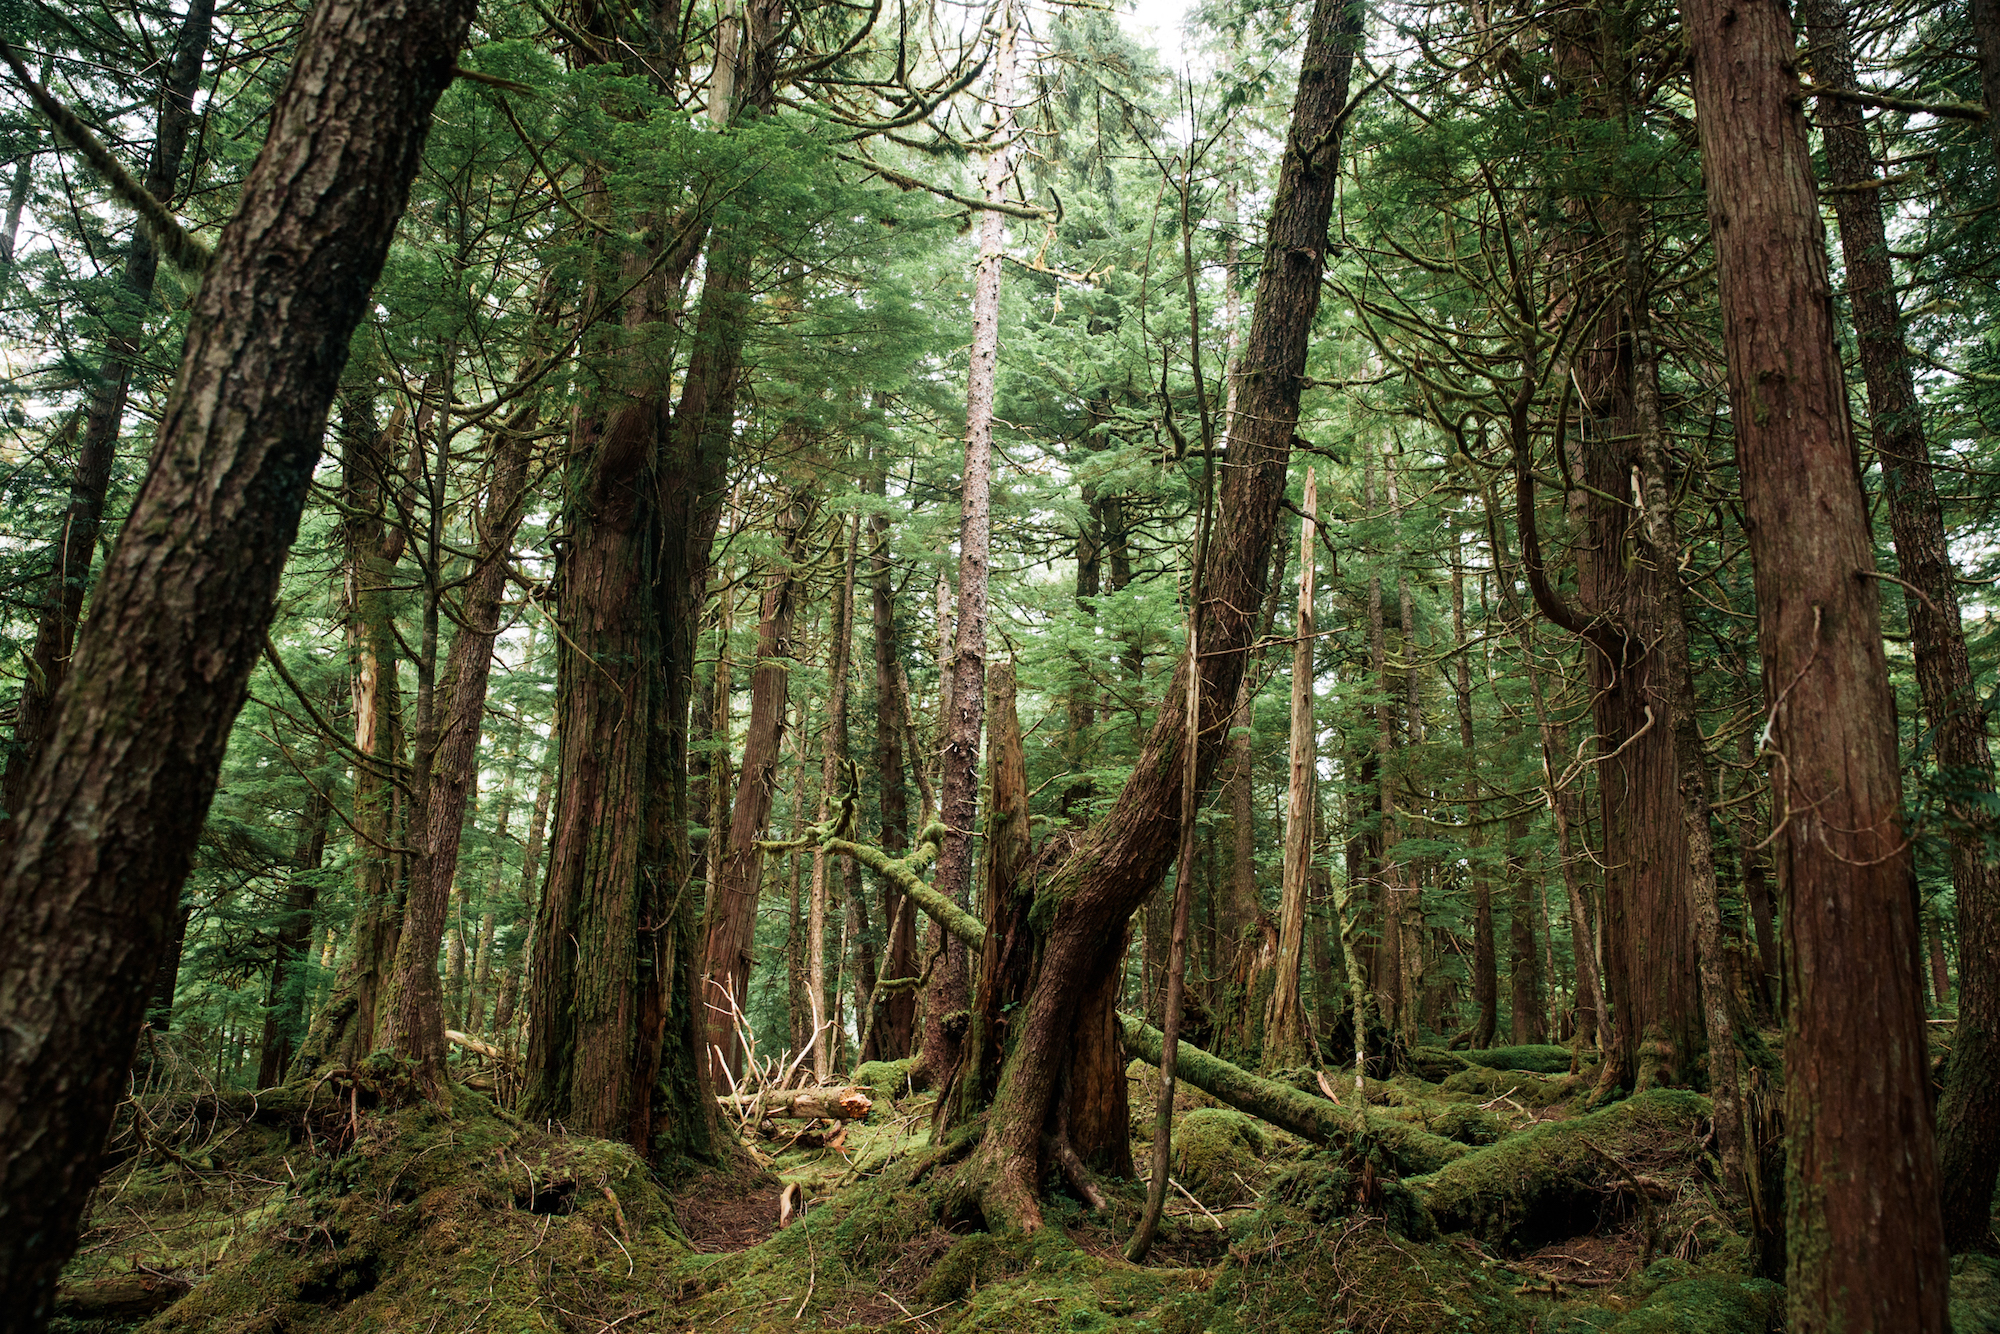 The rainforest in Haida Gwaii, Northern British Columbia